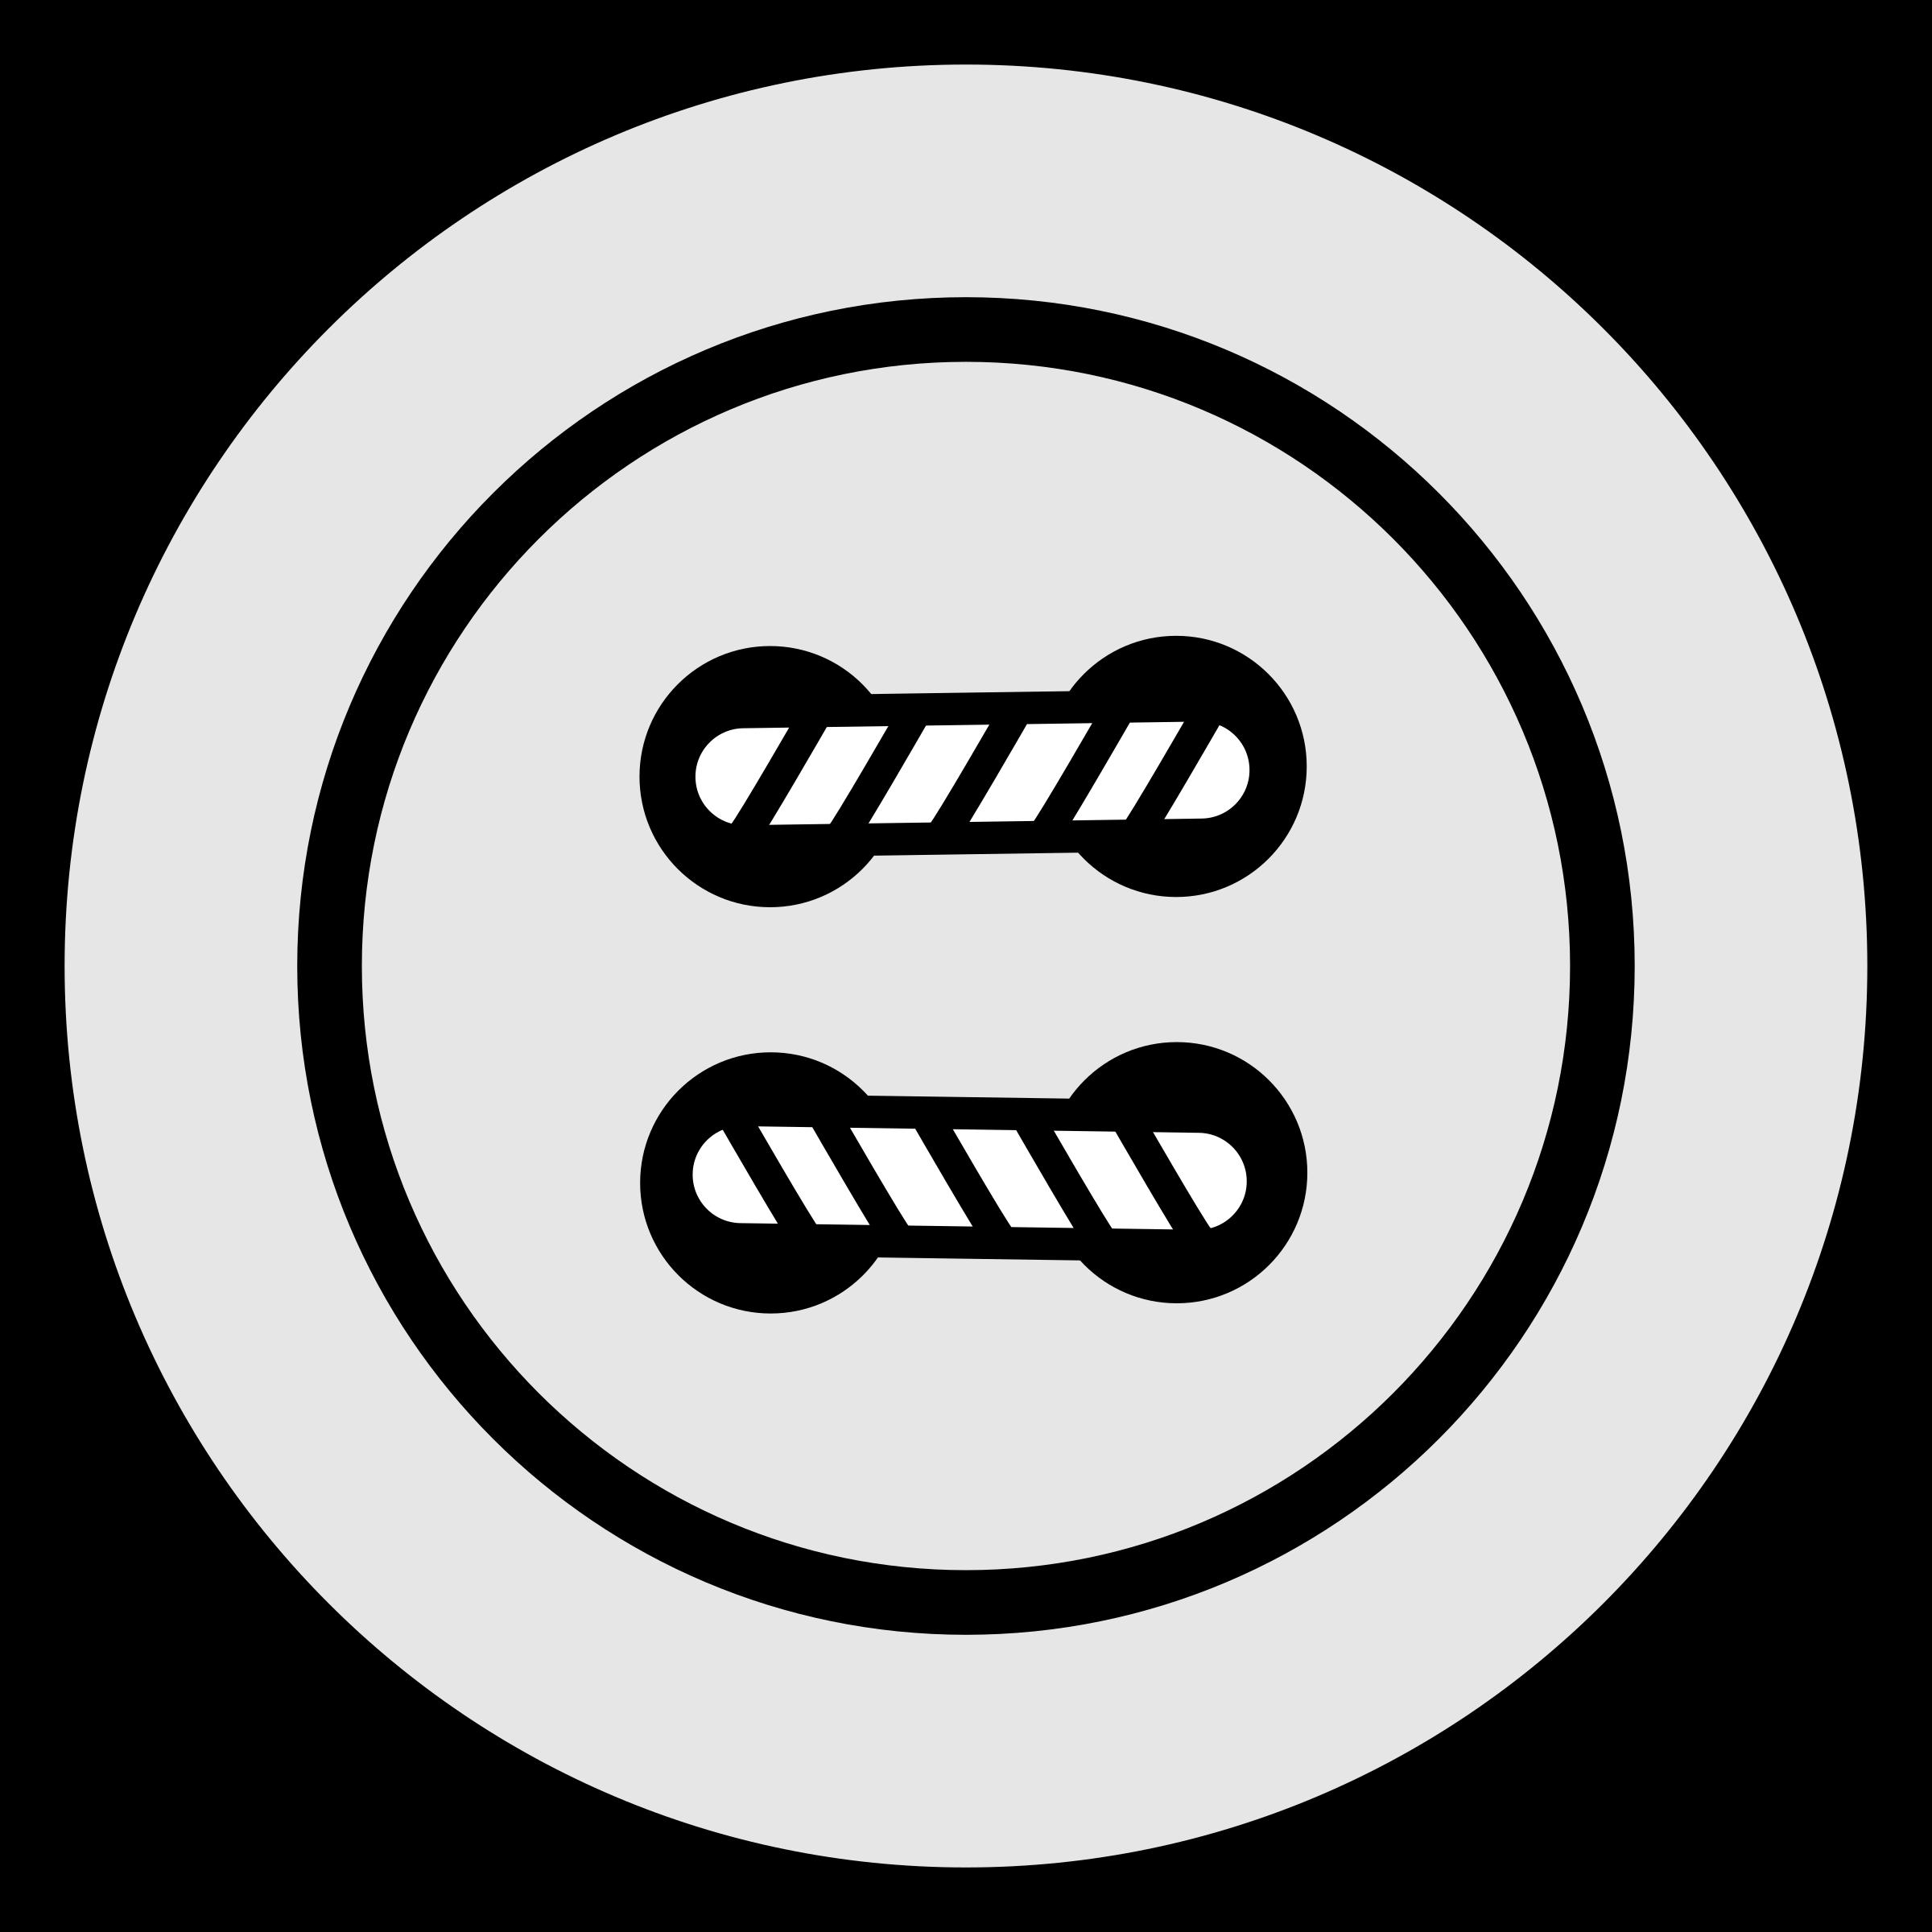 Button Clipart - 18 - J - Clipart Simple-button clipart - 18 - j - Clipart simple 4h button ClipartBarn-16